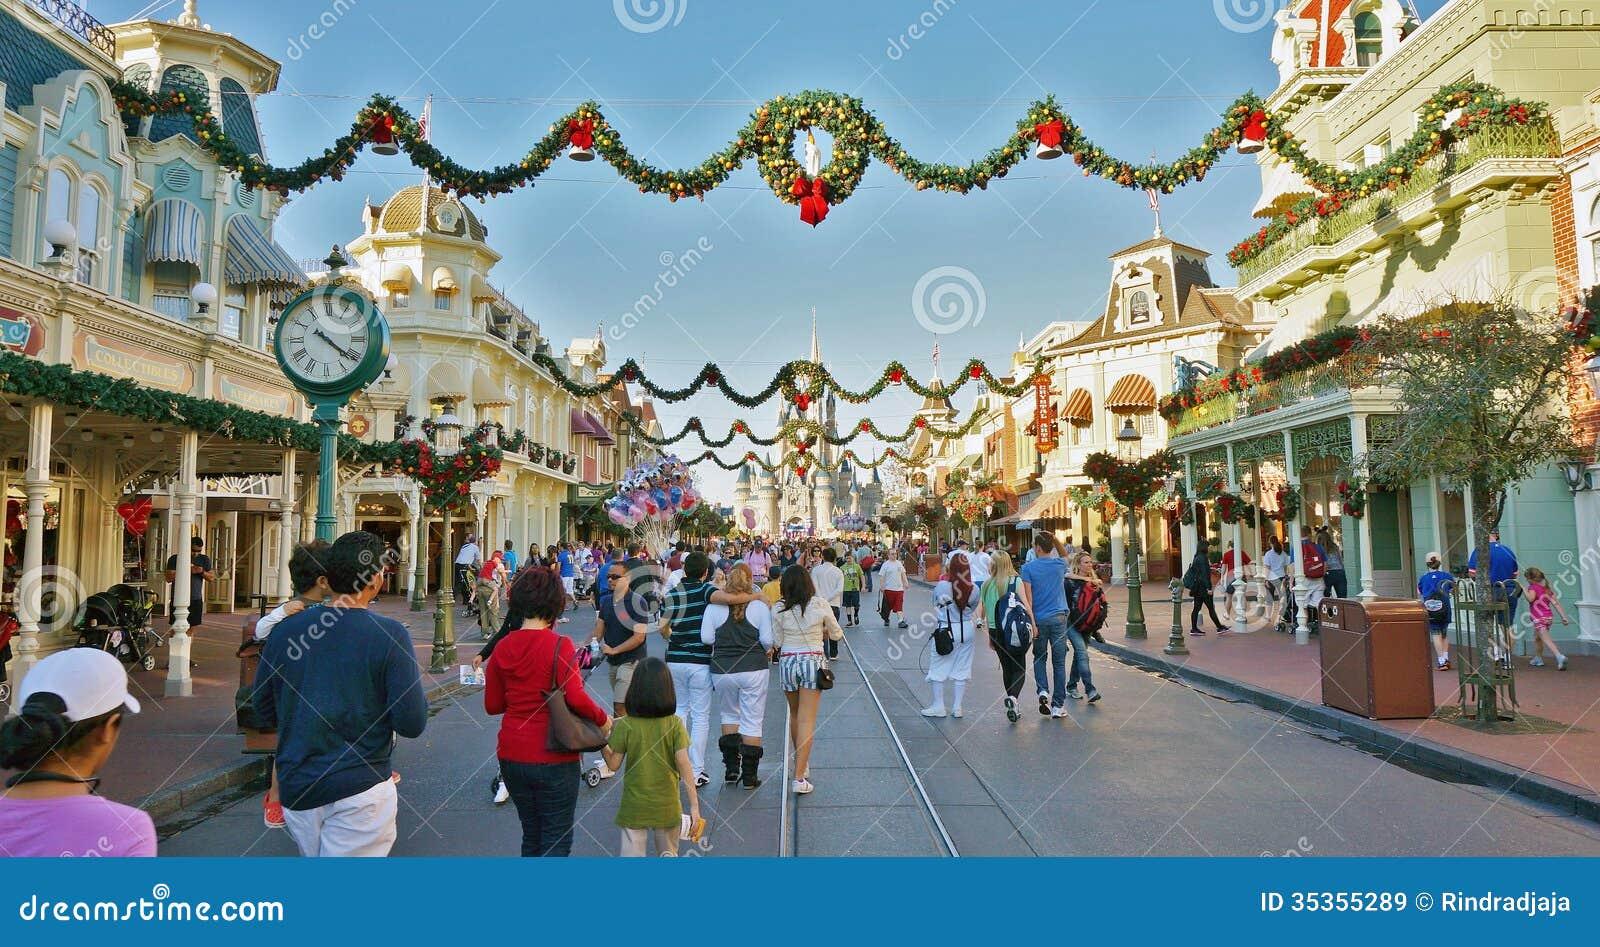 Image De Noel Walt Disney.Christmas Holiday Crowd At Magic Kingdom Walt Disney World